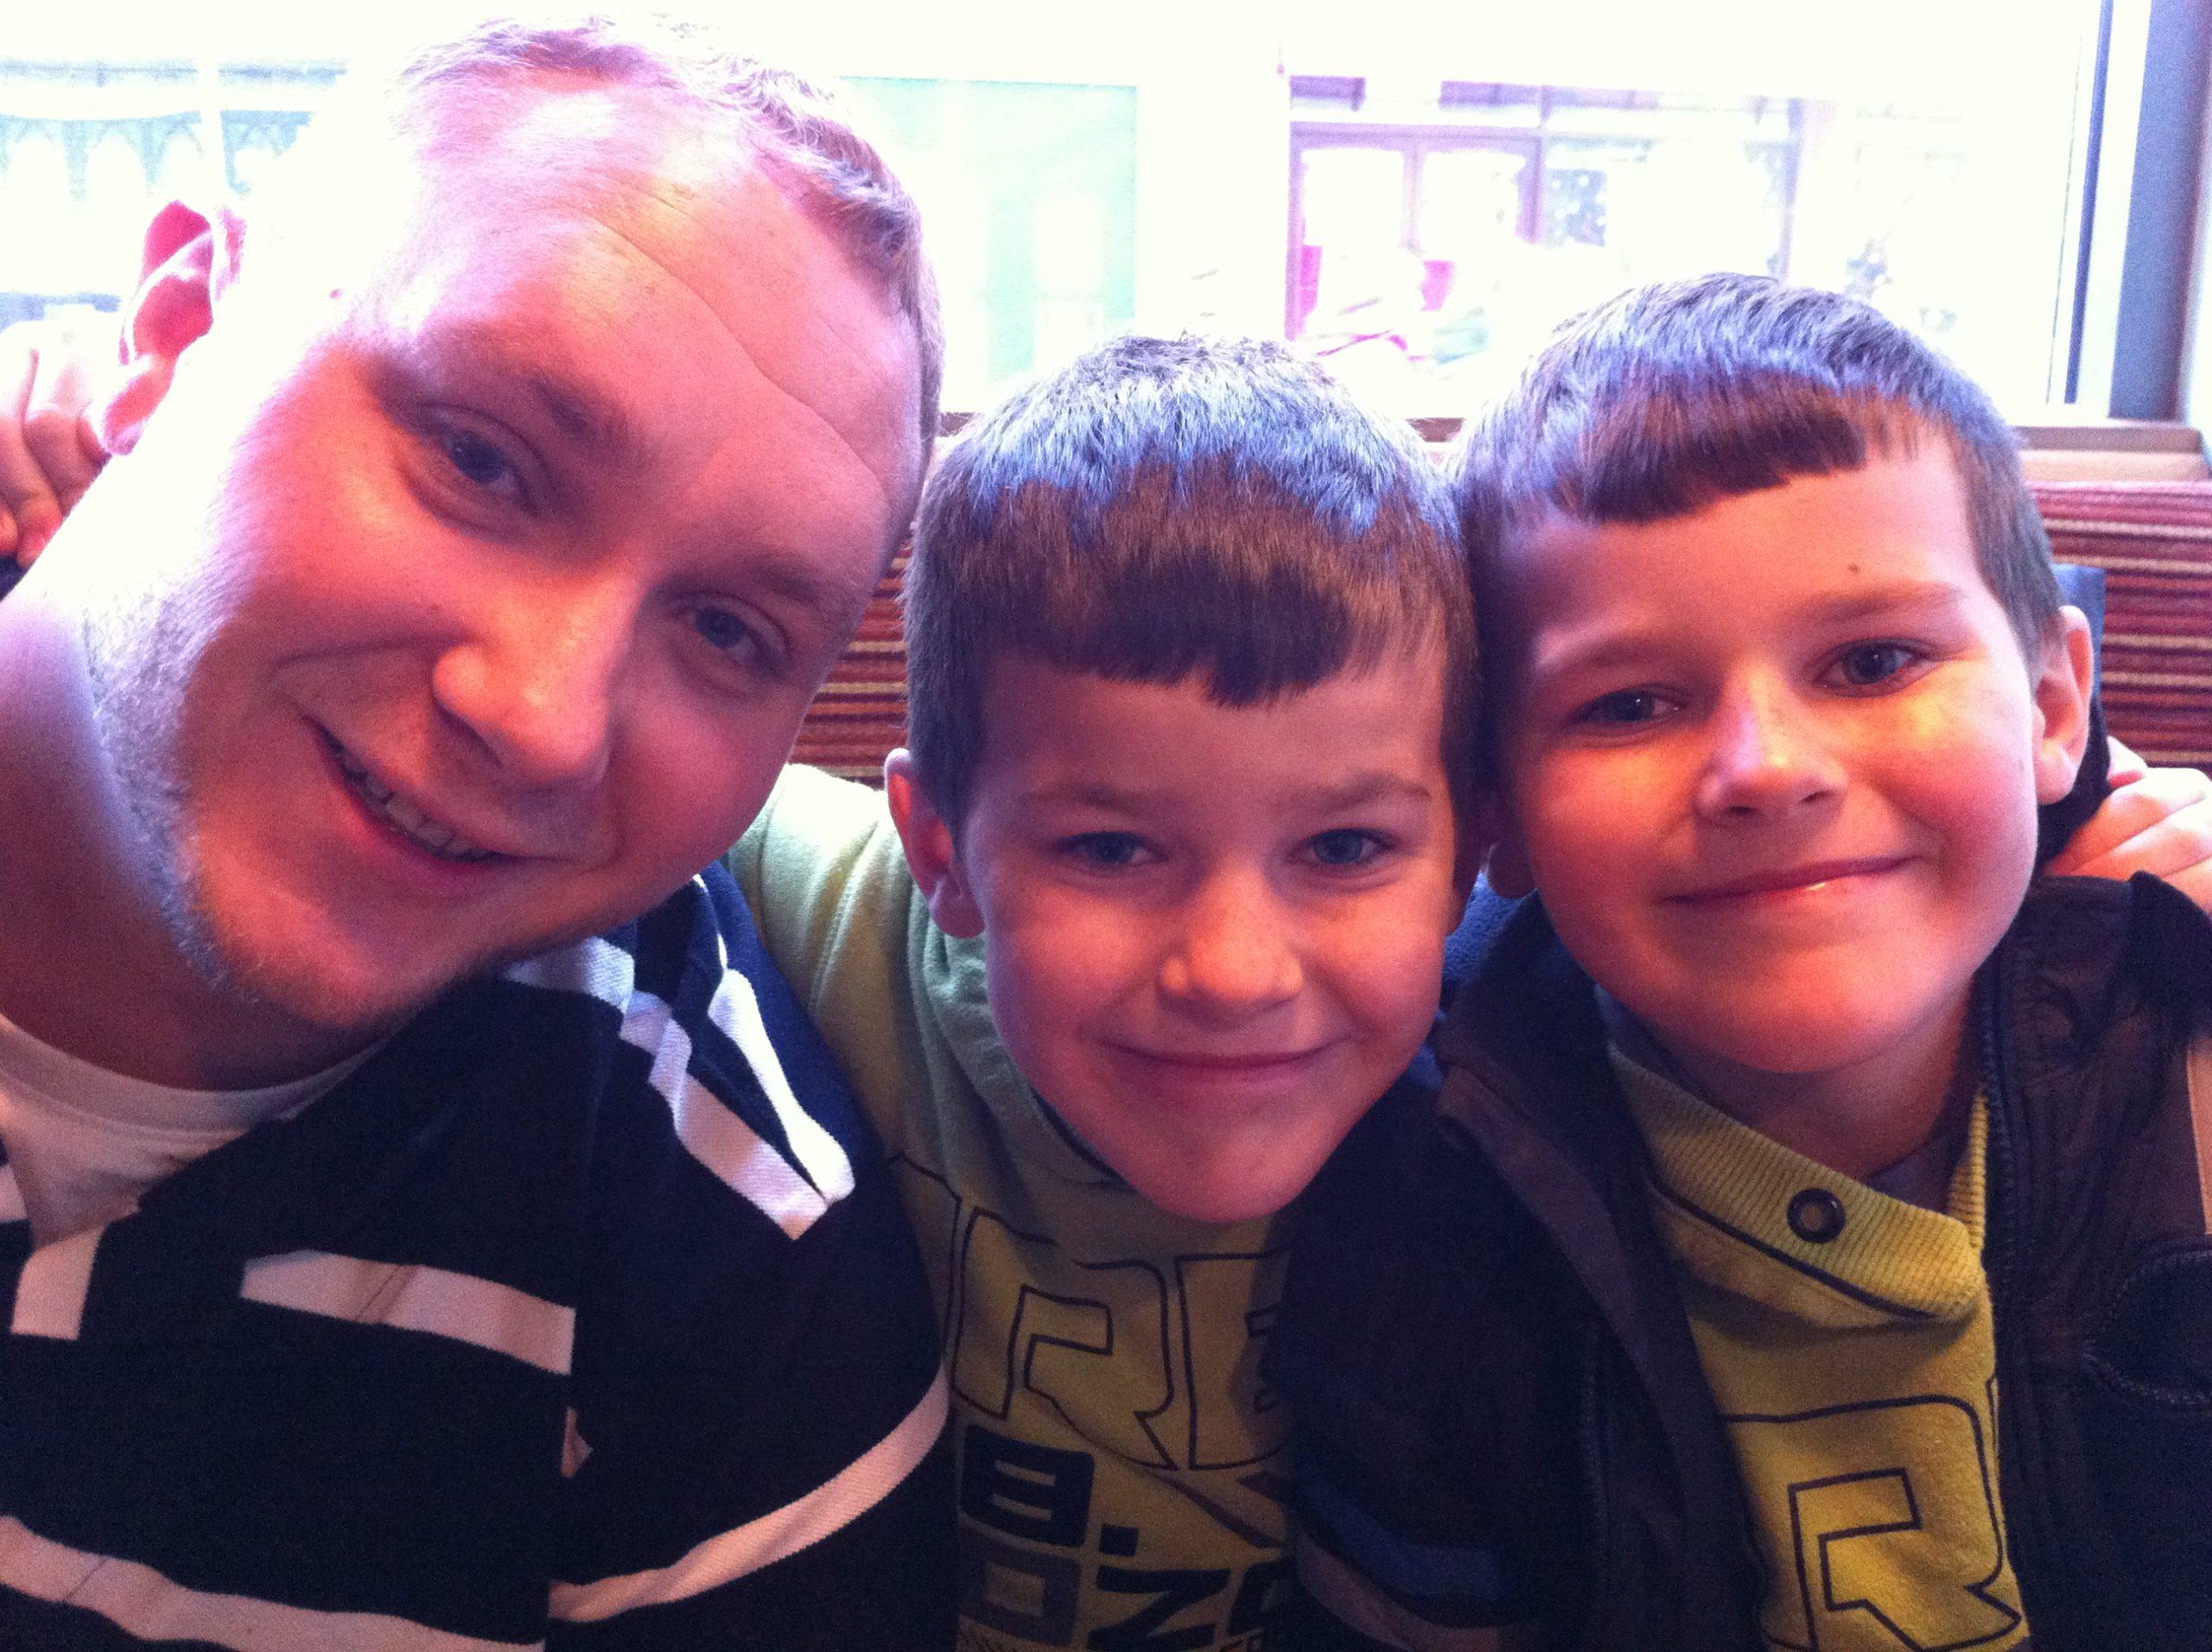 Jon, Dan and Zak